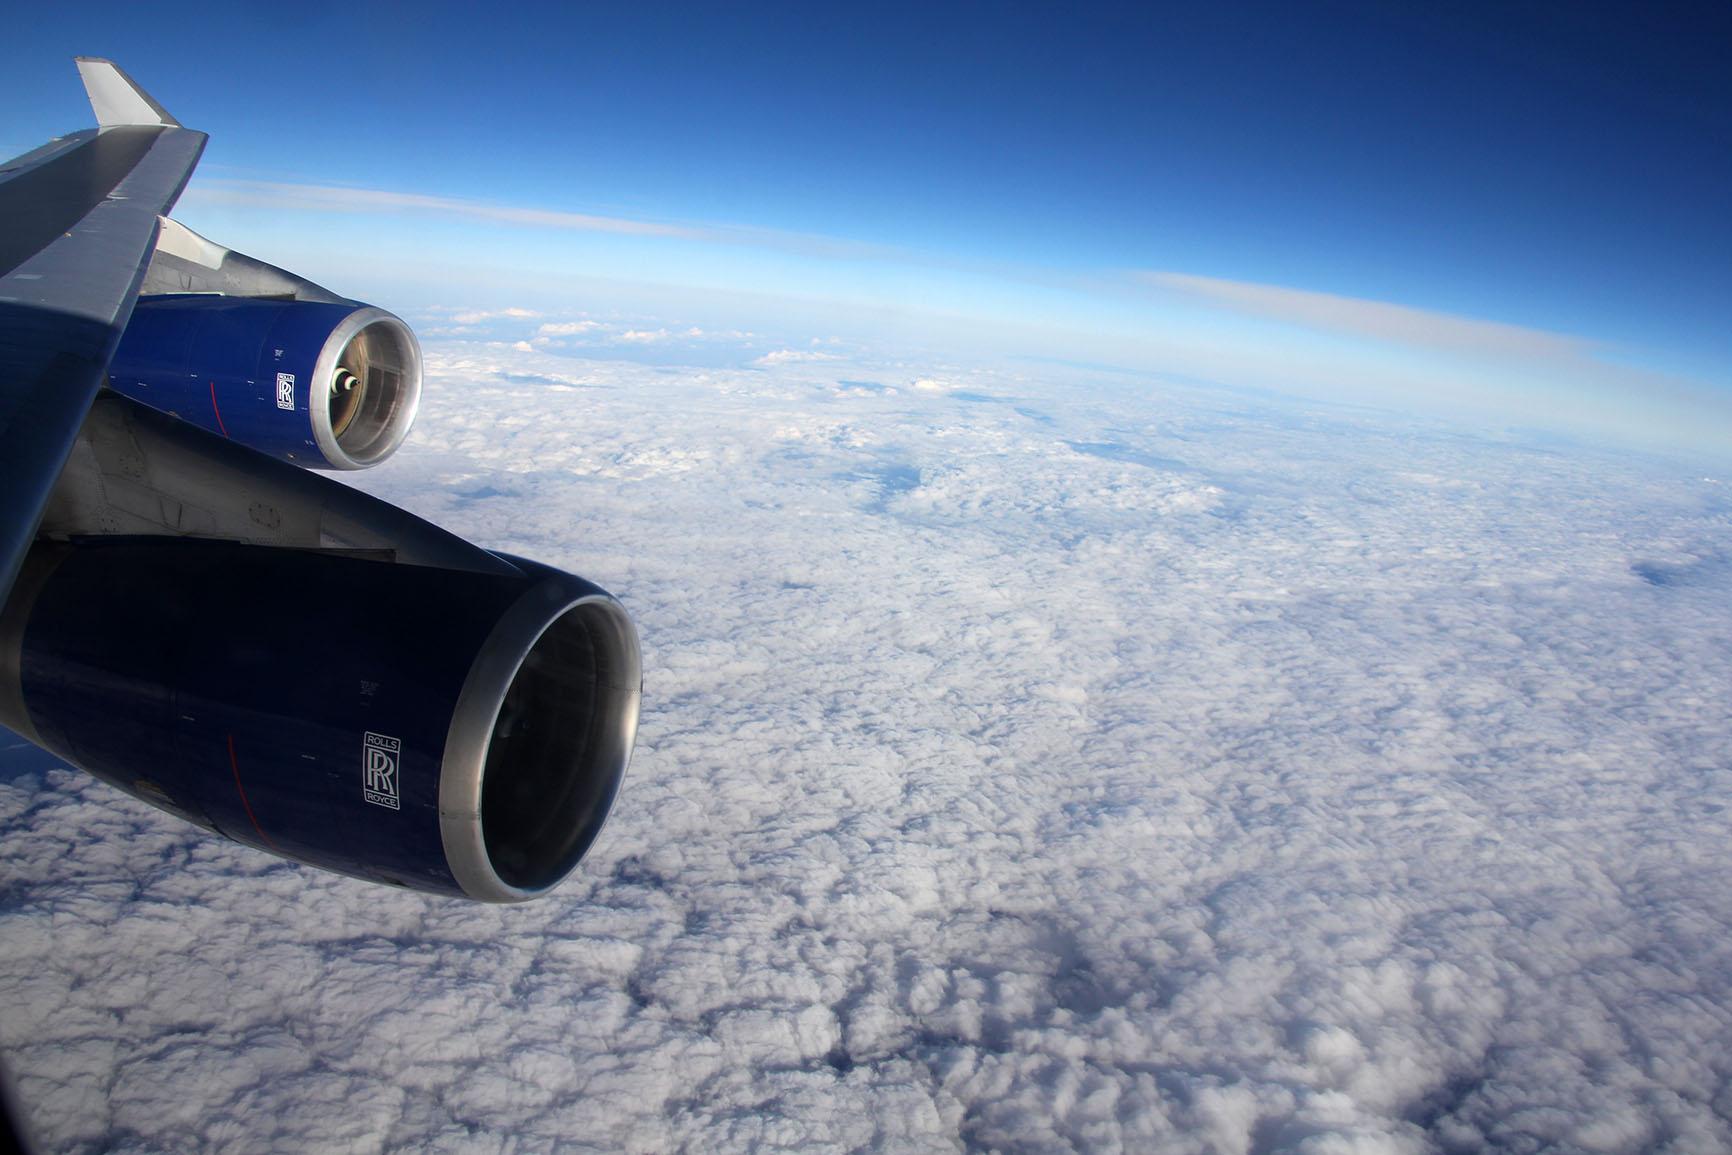 flight-engines-copyright-jono-vernon-powell